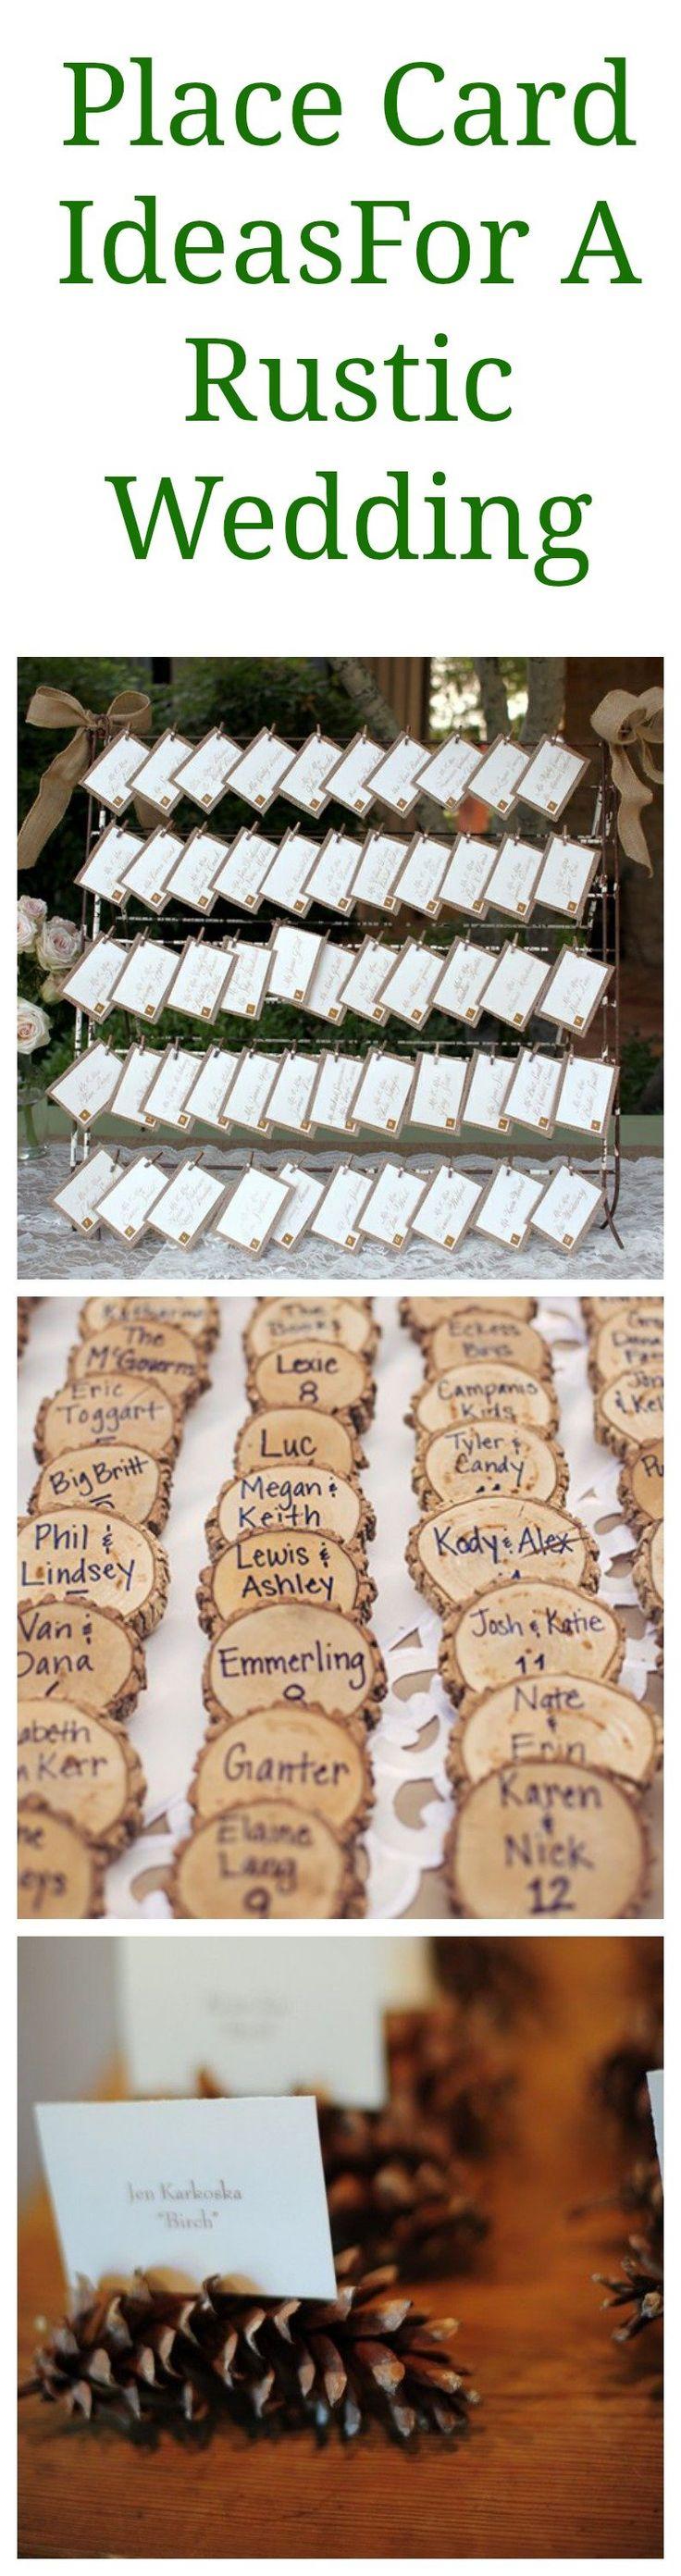 best fall weddings images on pinterest holidays holidays